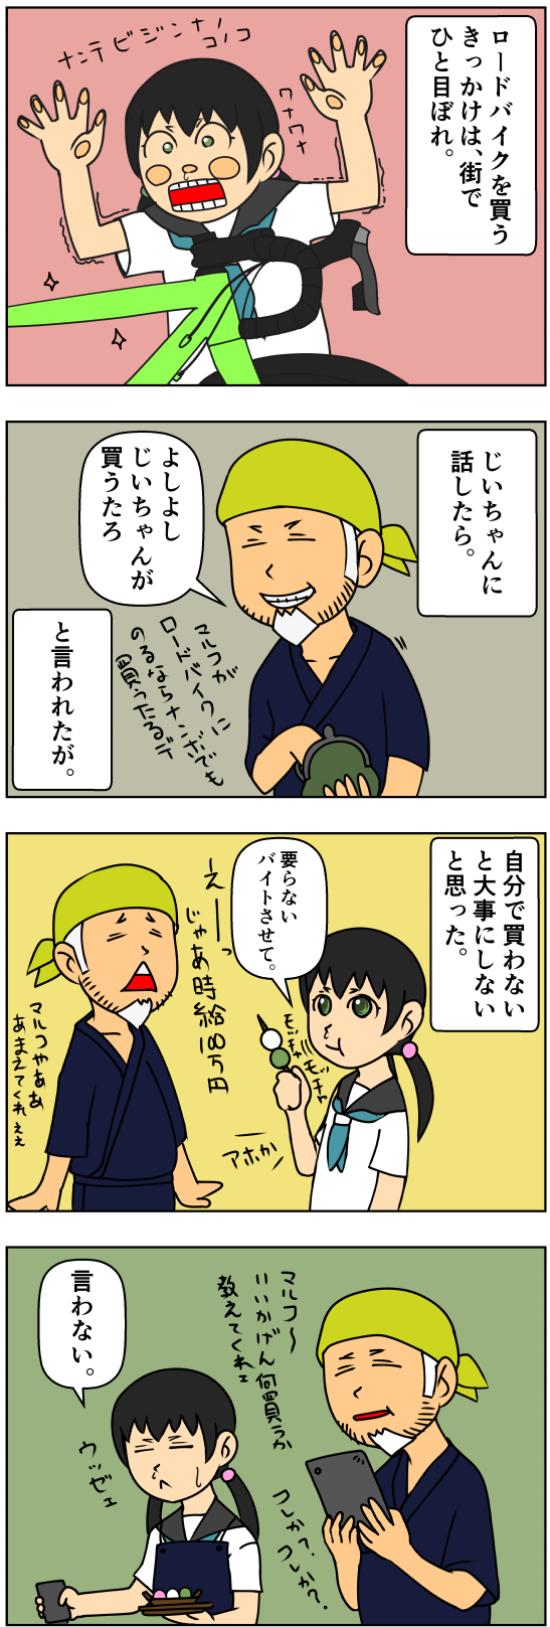 sansyokudanngochan-02-3.jpg